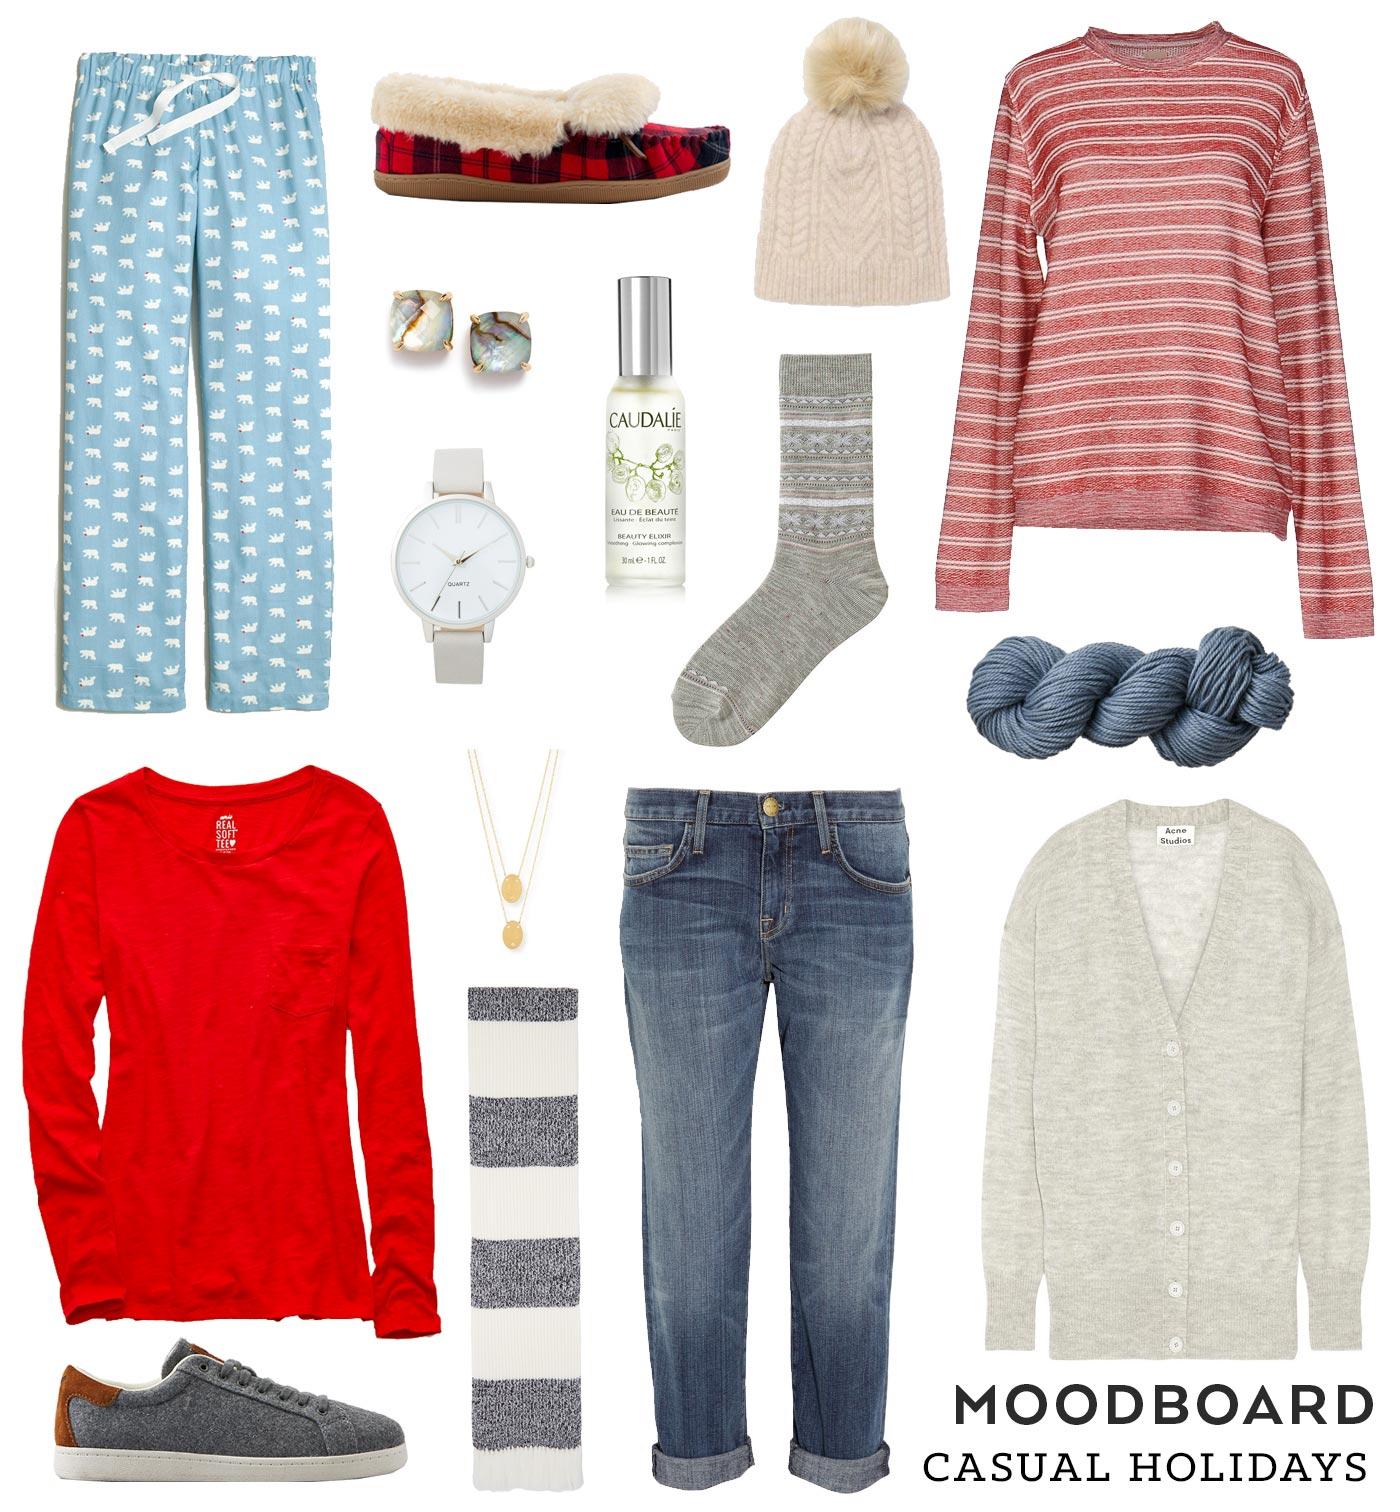 Moodboard –Casual Holidays   Sew DIY